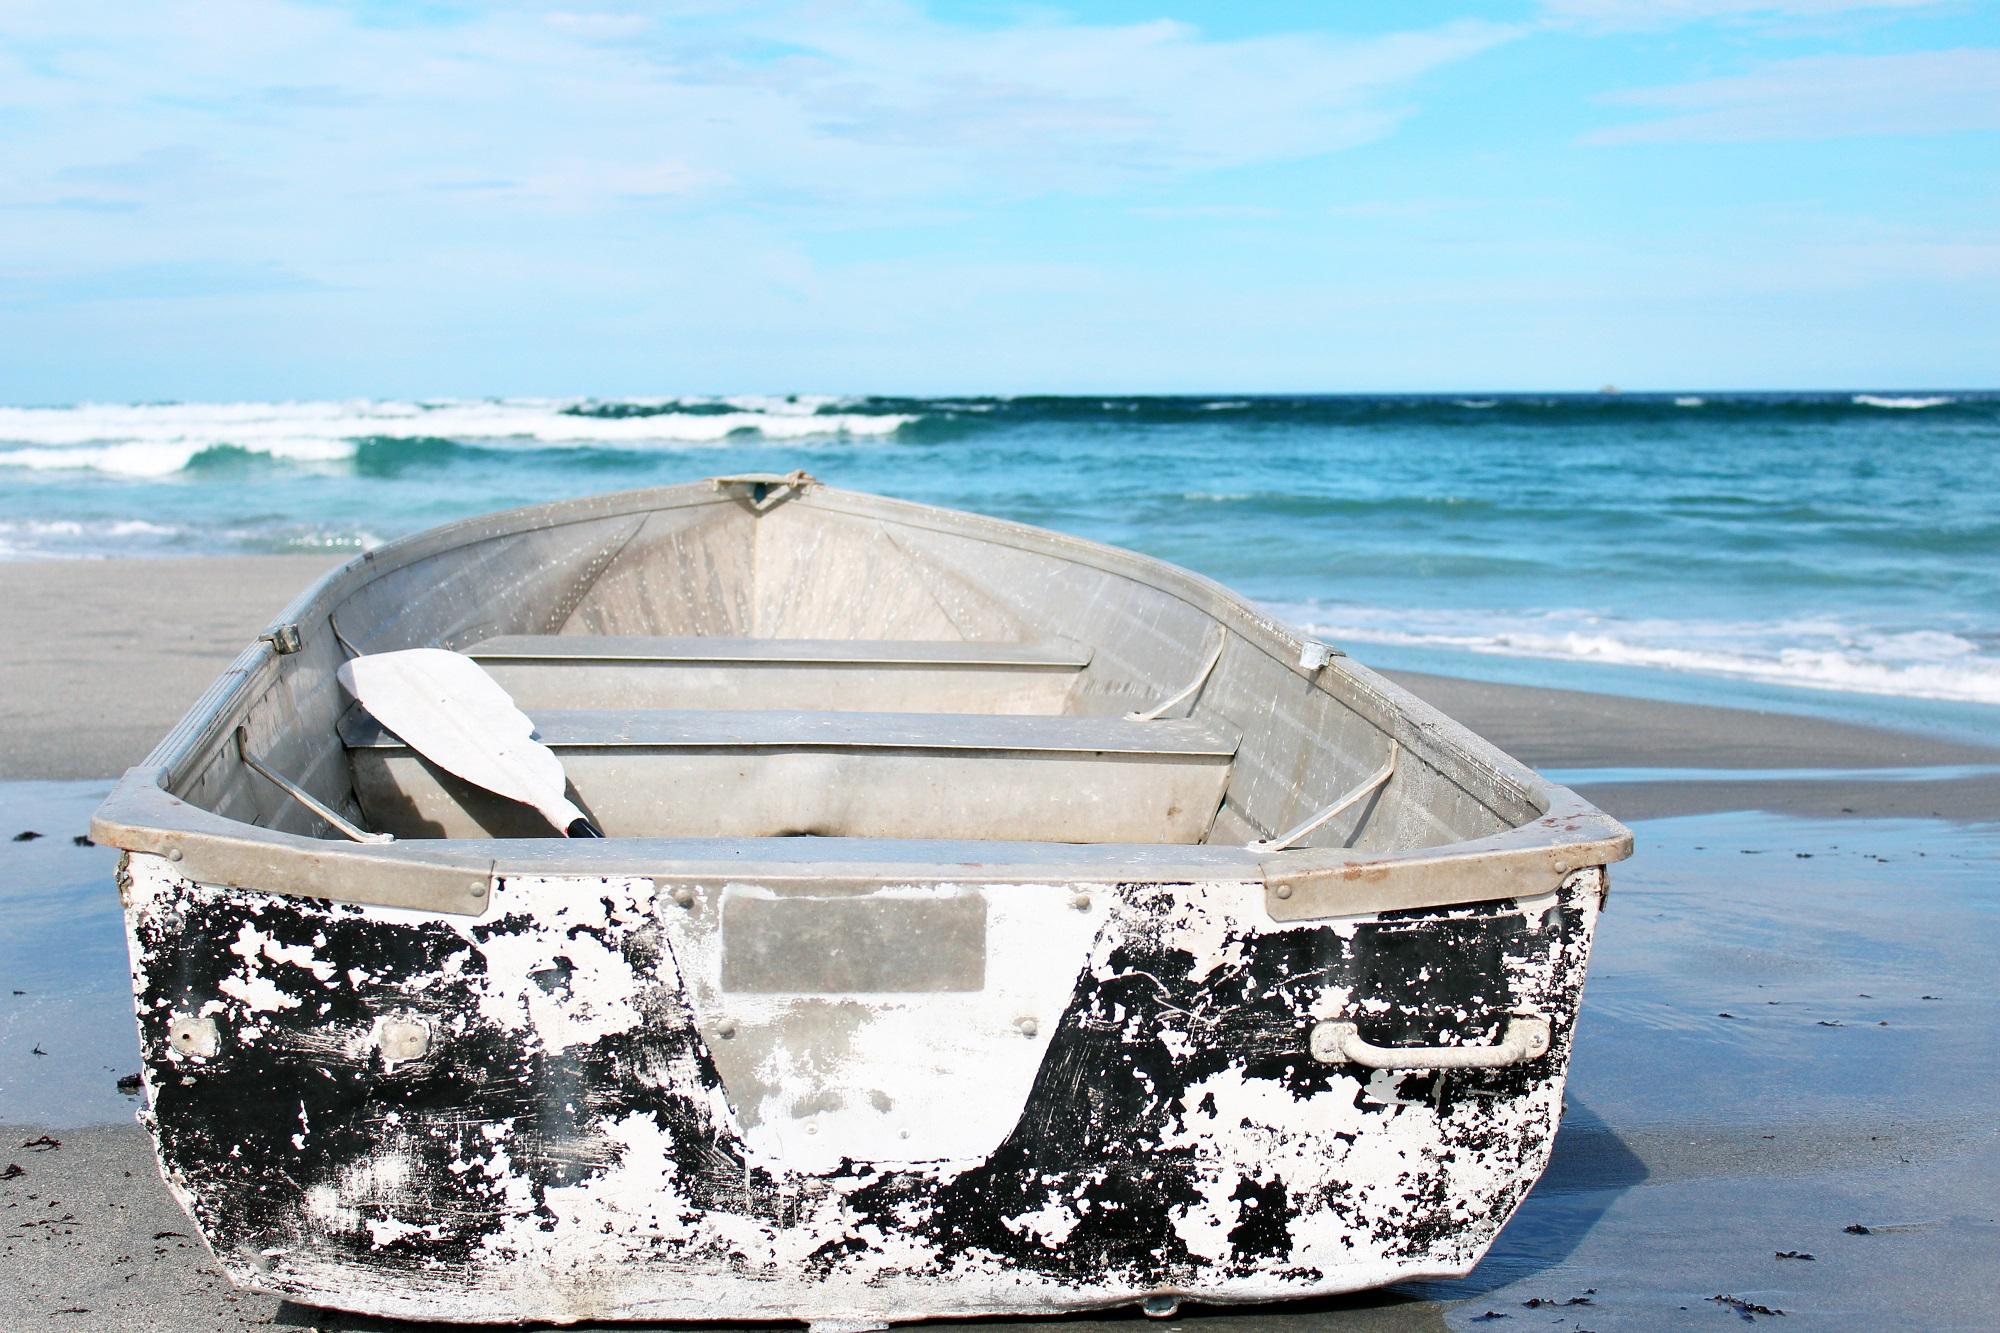 delray beach FL patrick coombe